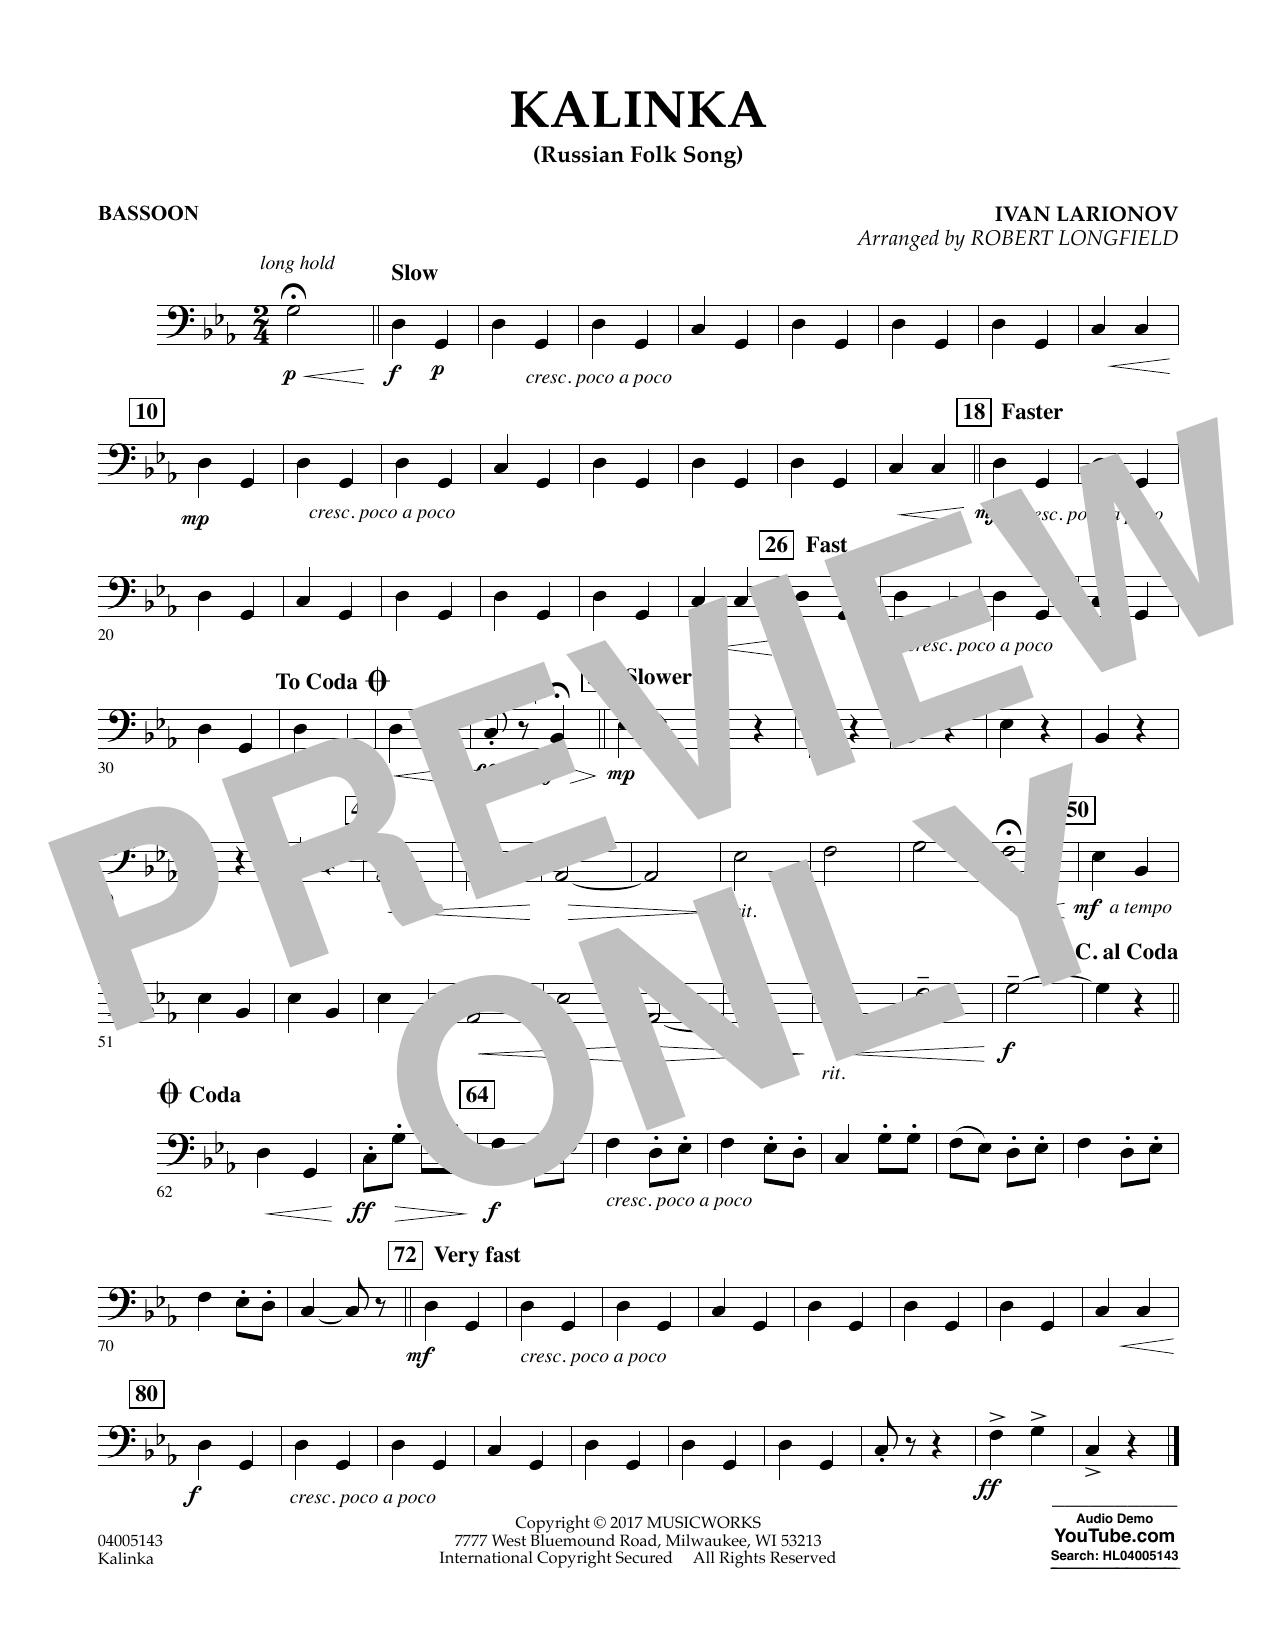 Kalinka (Russian Folk Song) - Bassoon Sheet Music